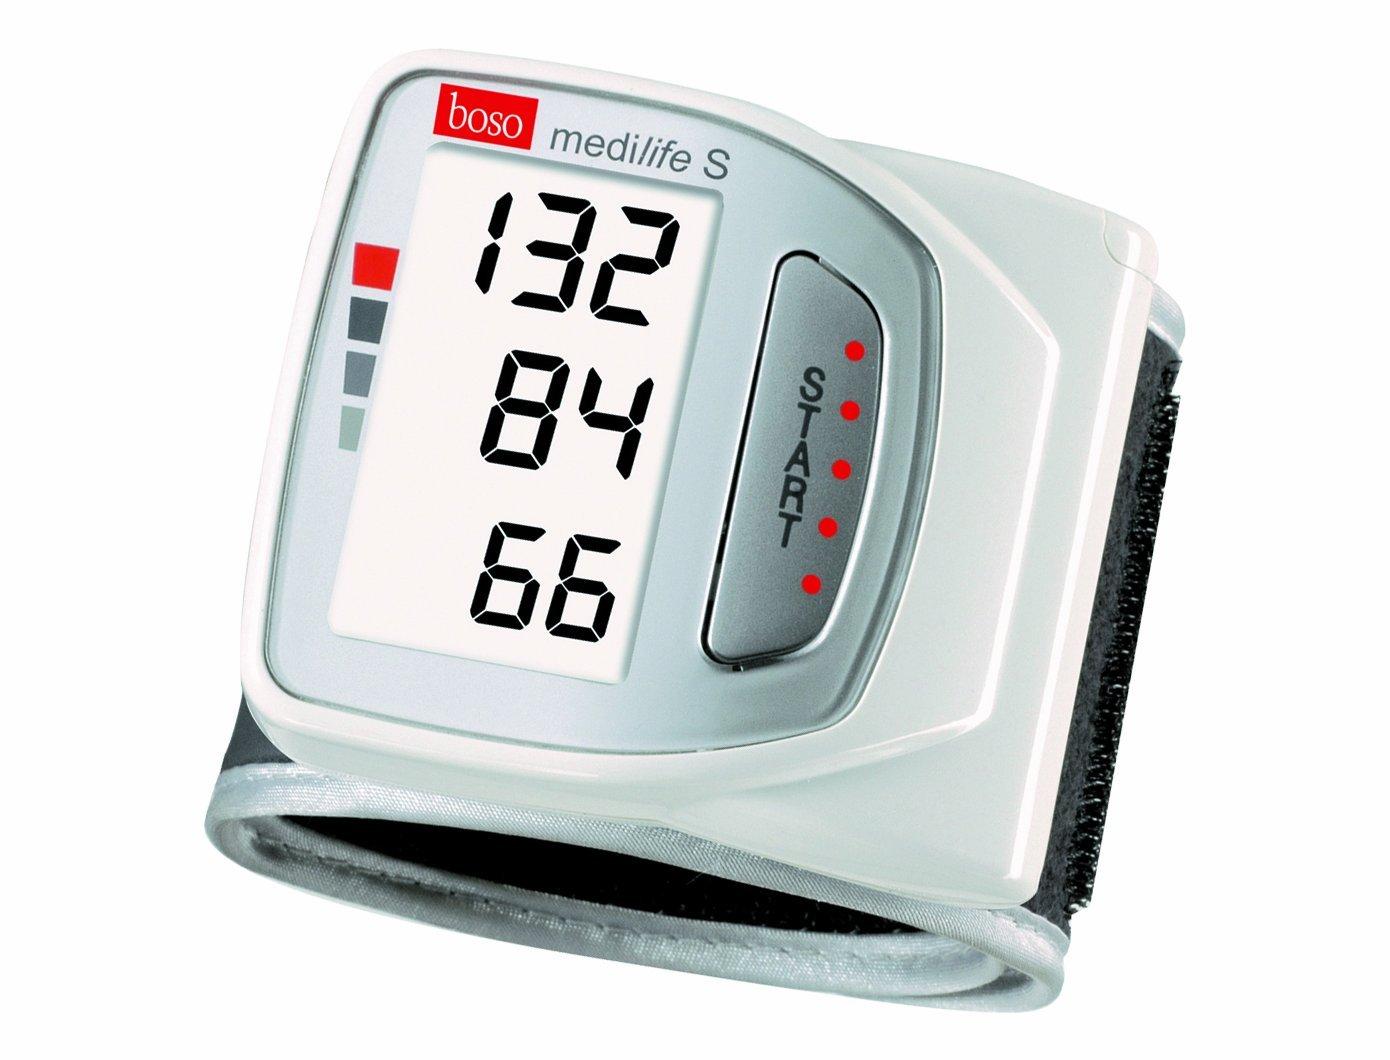 Handgelenk-Blutdruckmessgerät Boso Medilife S